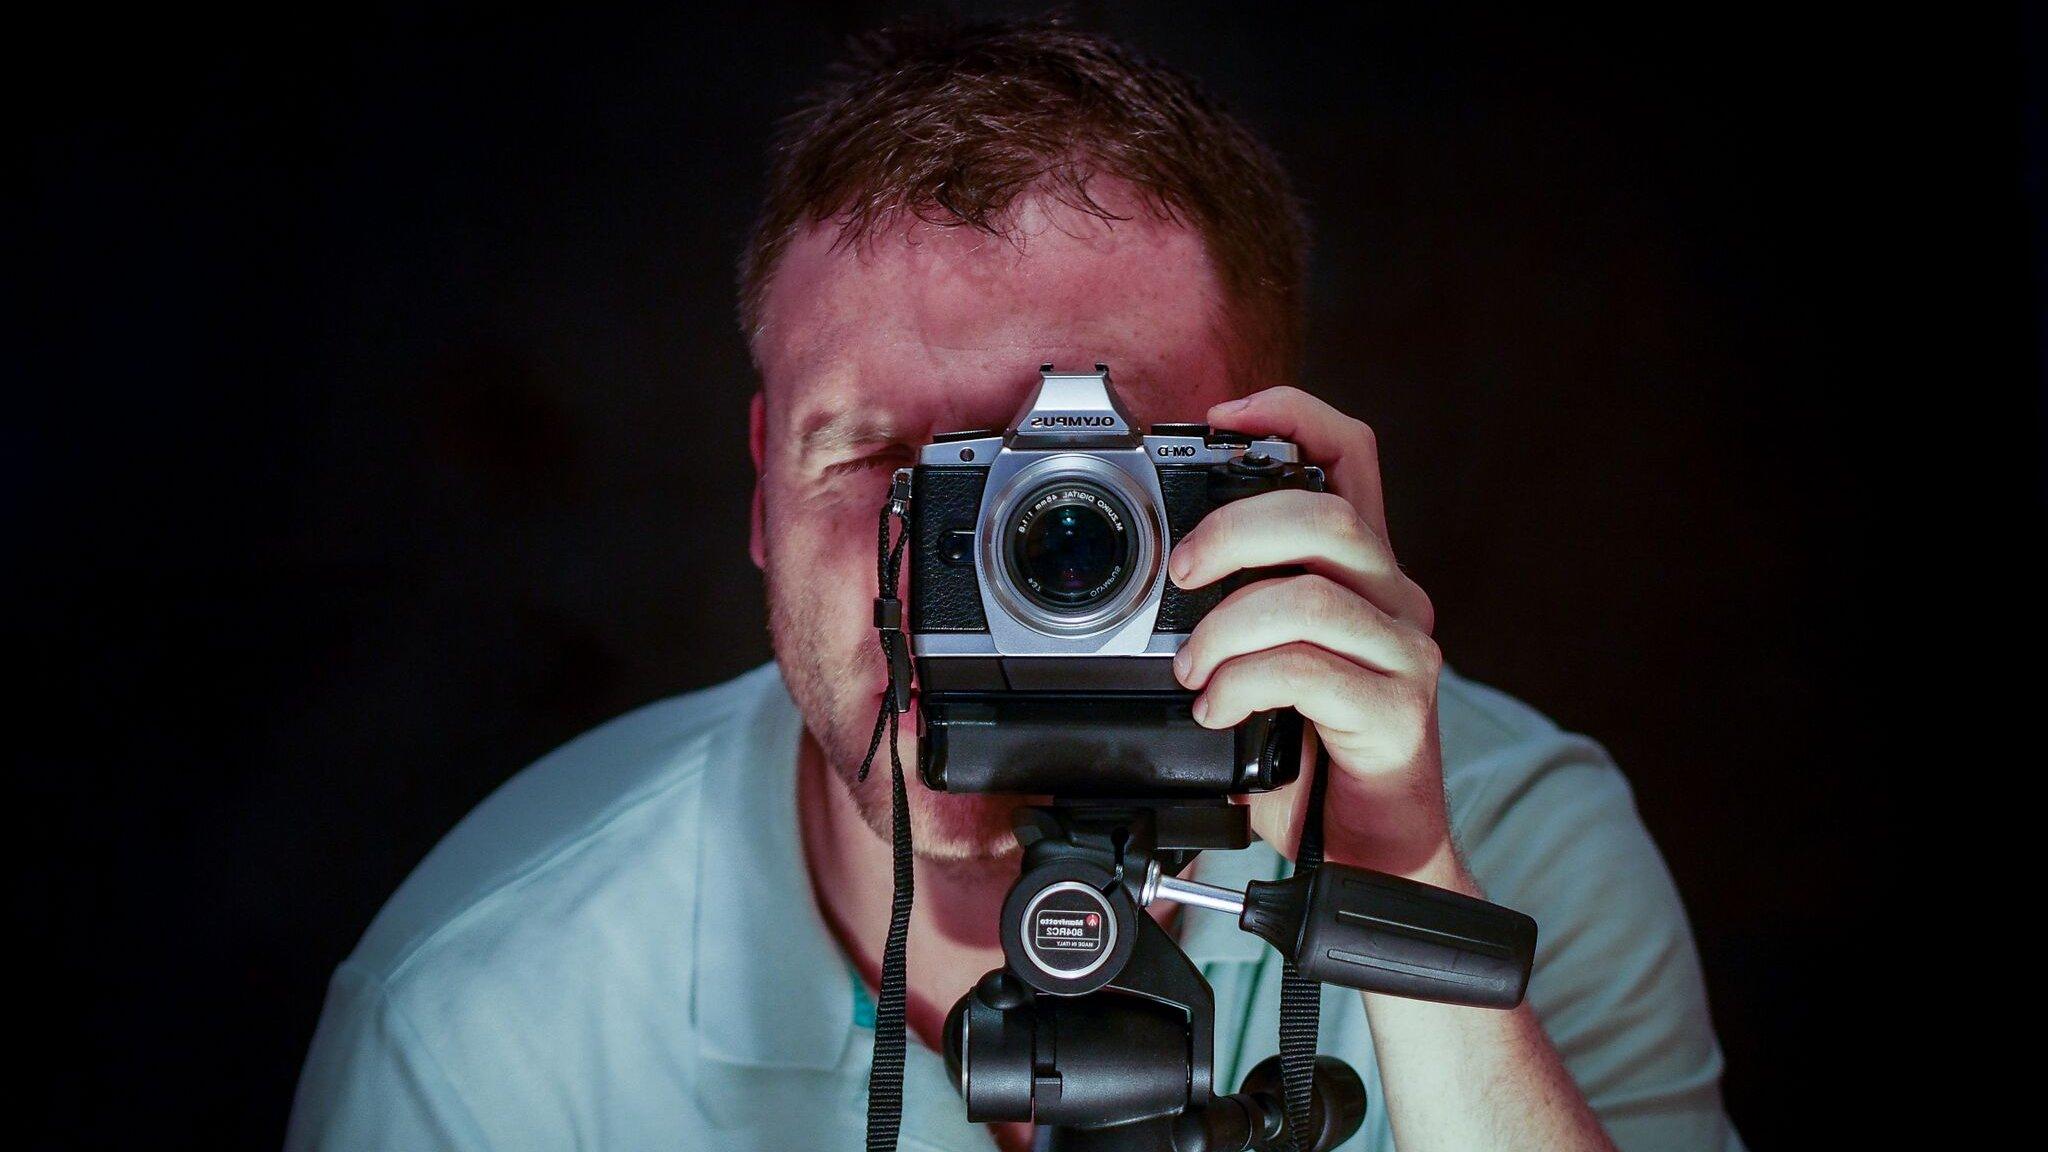 Mental Health Awareness Week: 'My camera helped me beat anxiety'